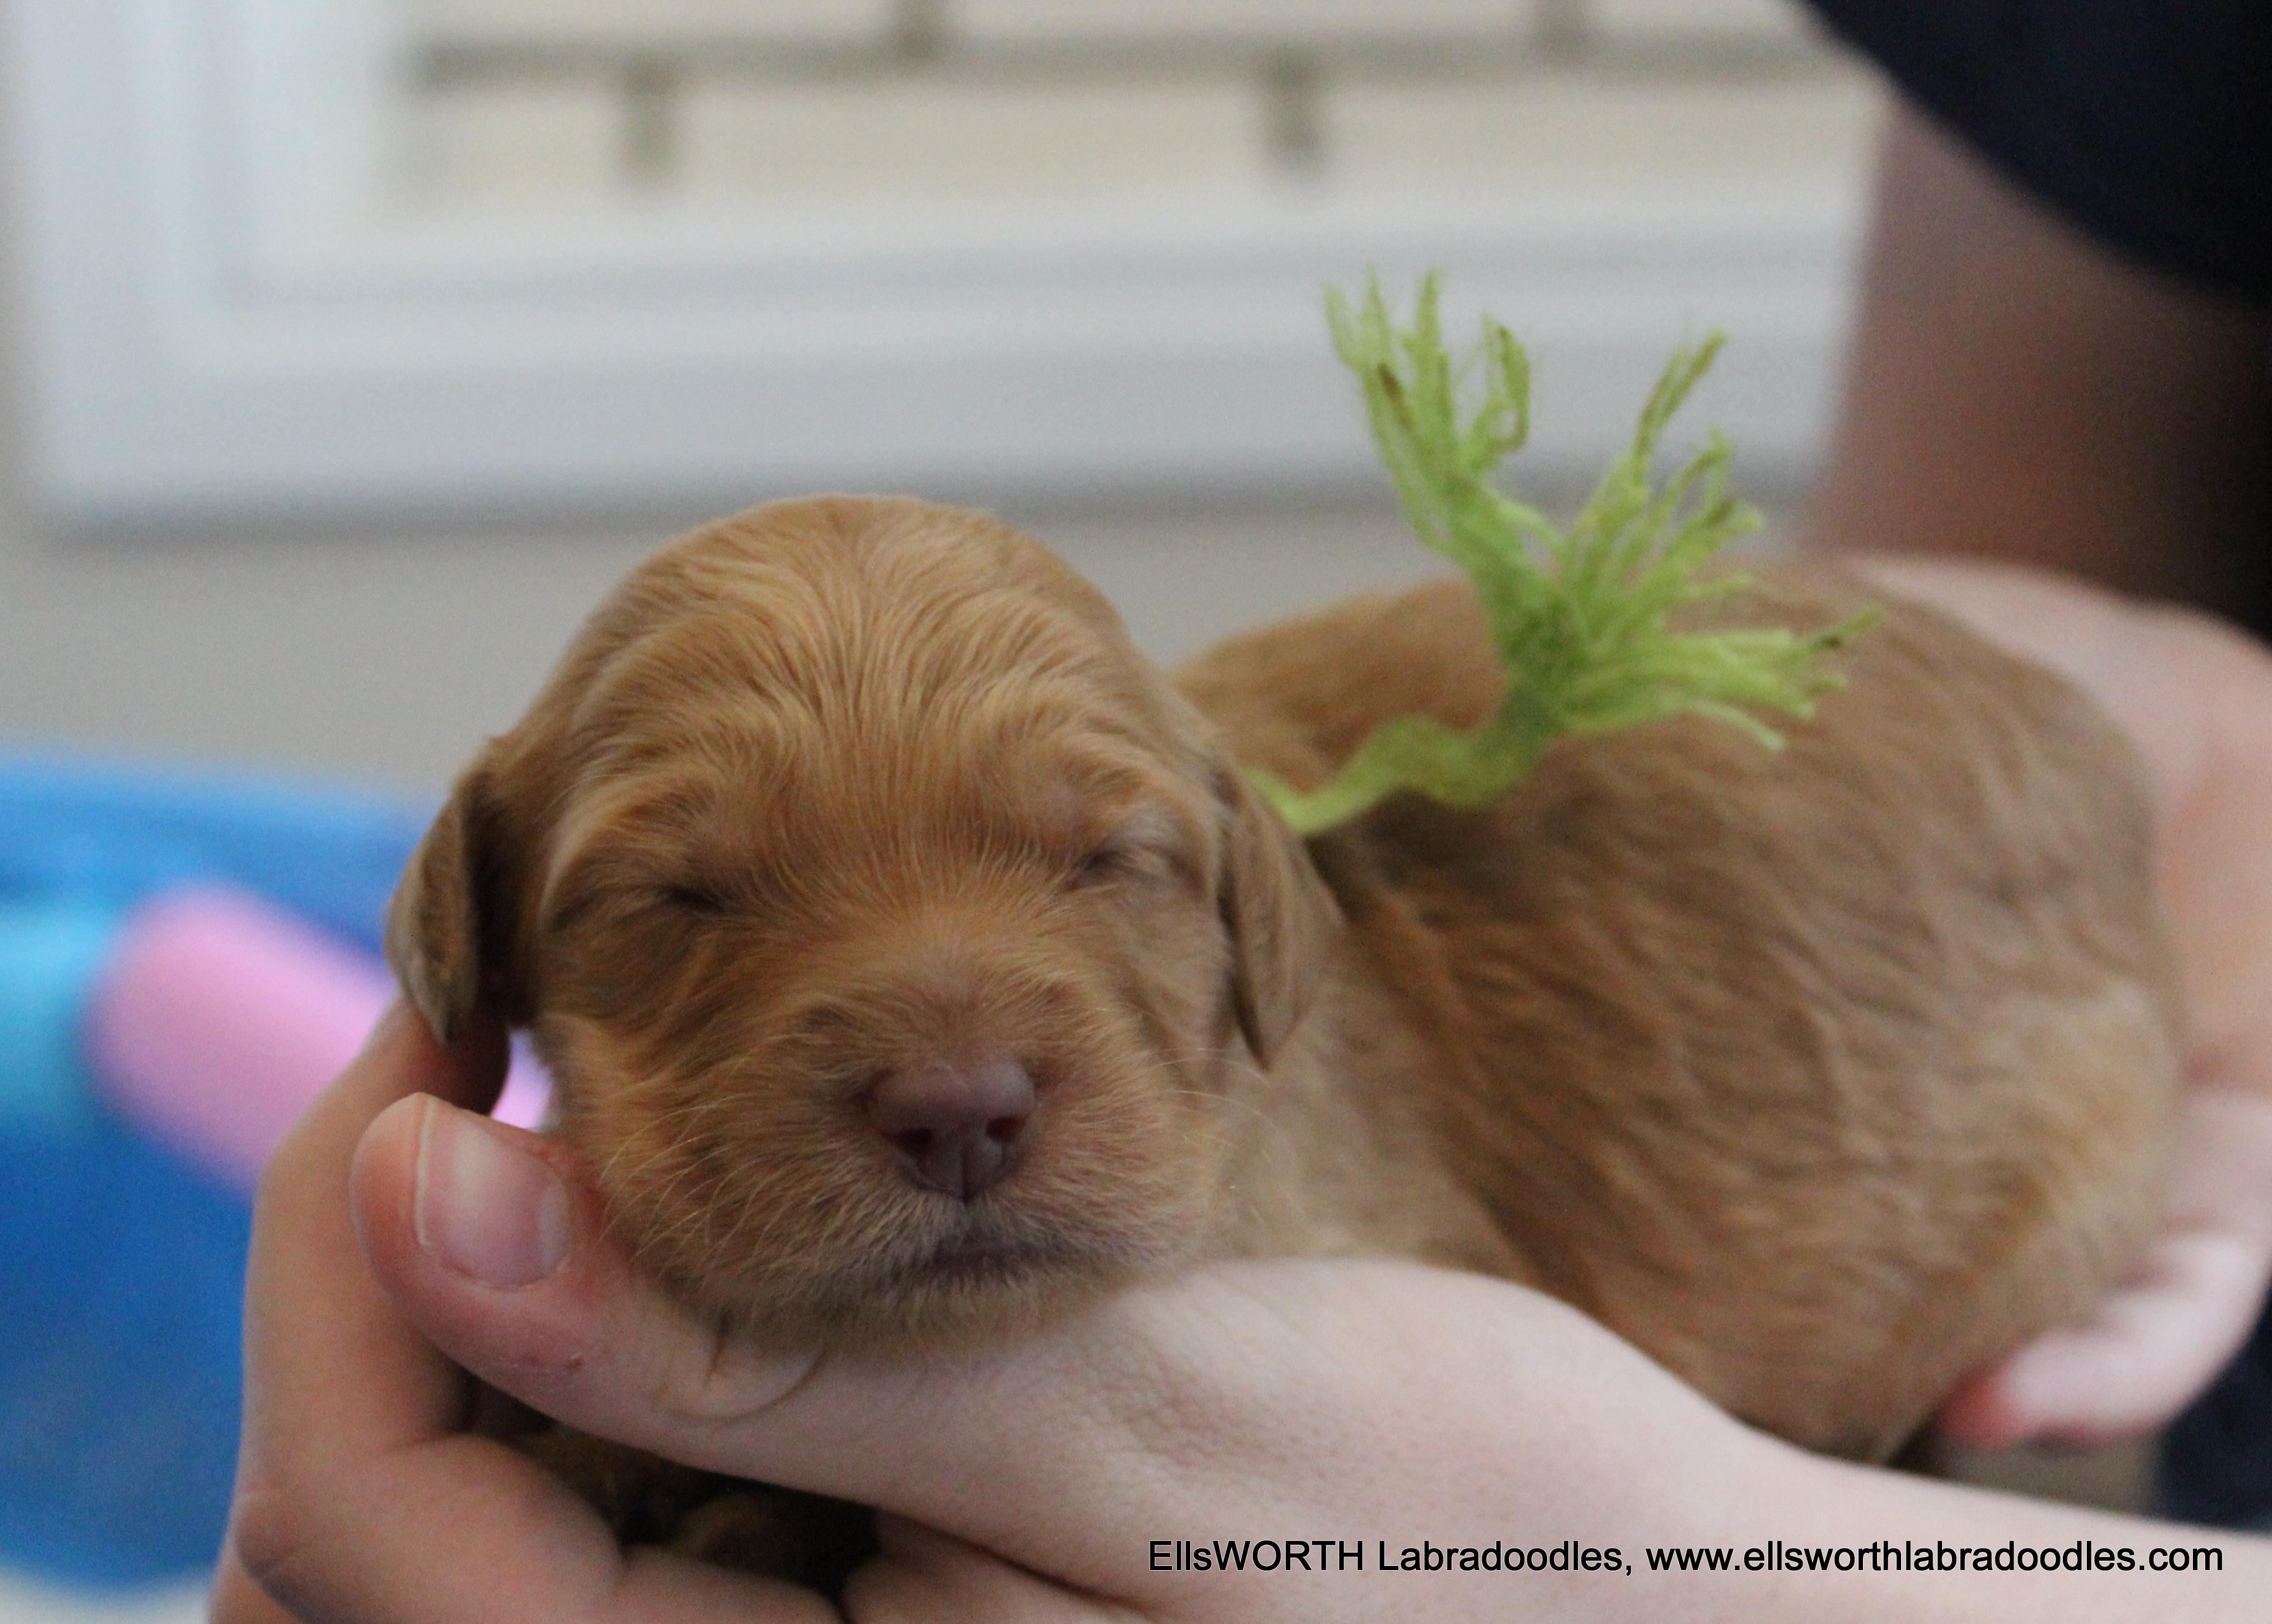 Winnie is just a little smaller